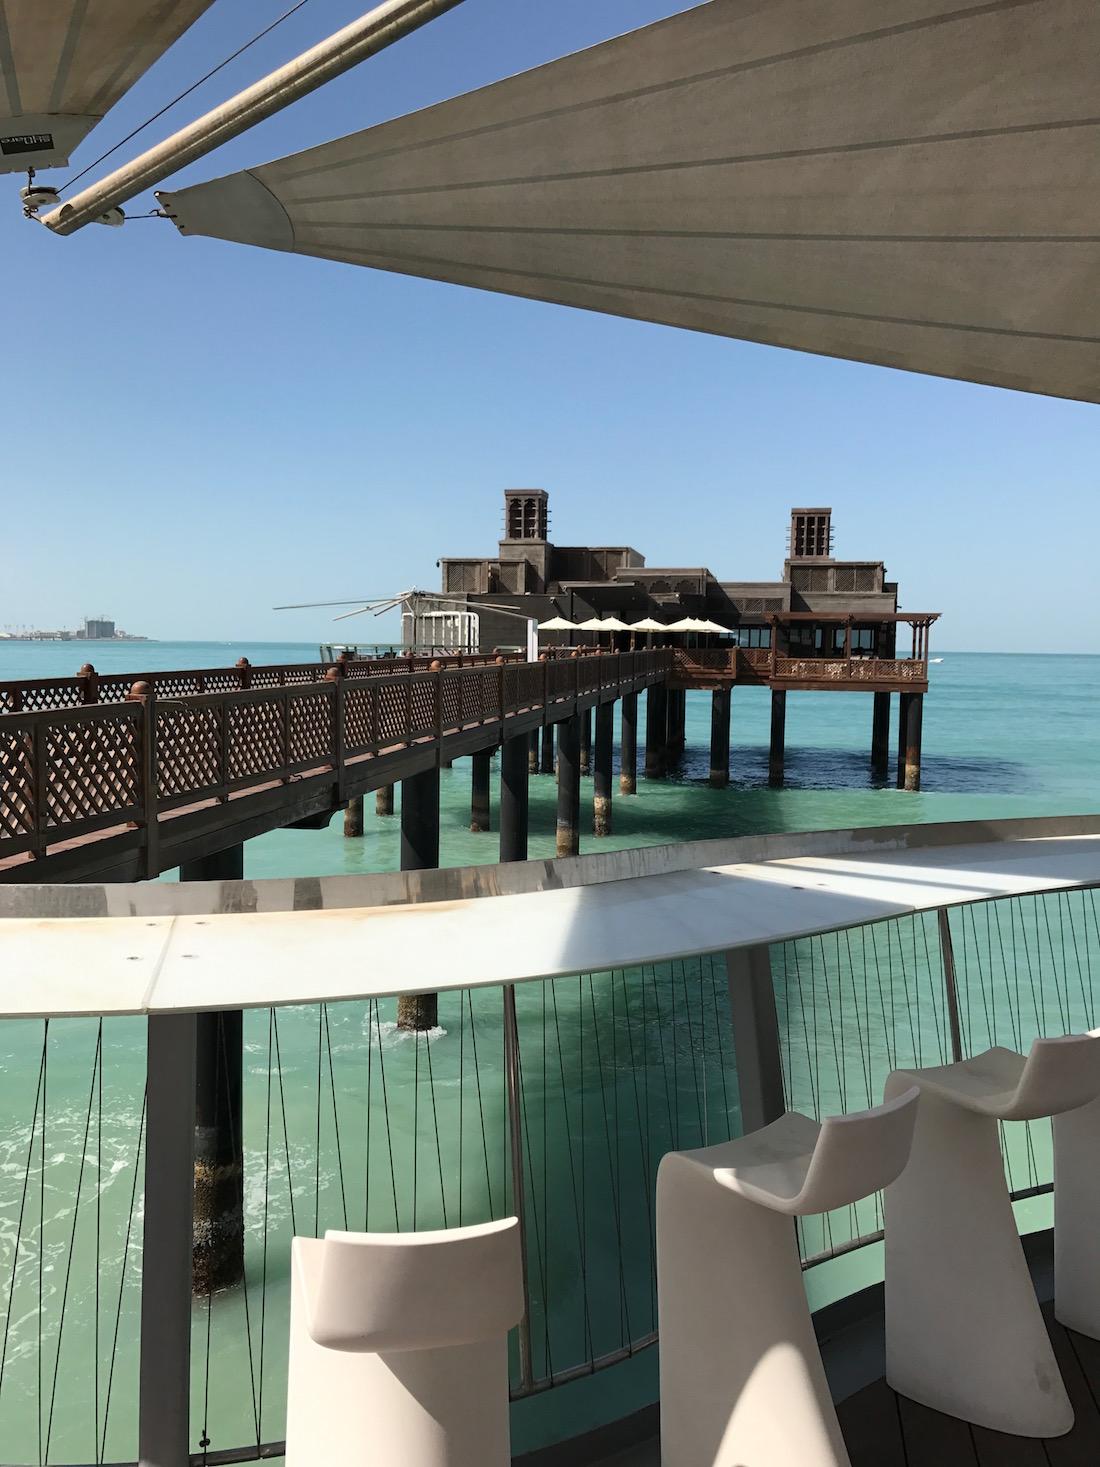 Pierchic Restaurant at Hotel Al Qasr, Dubai